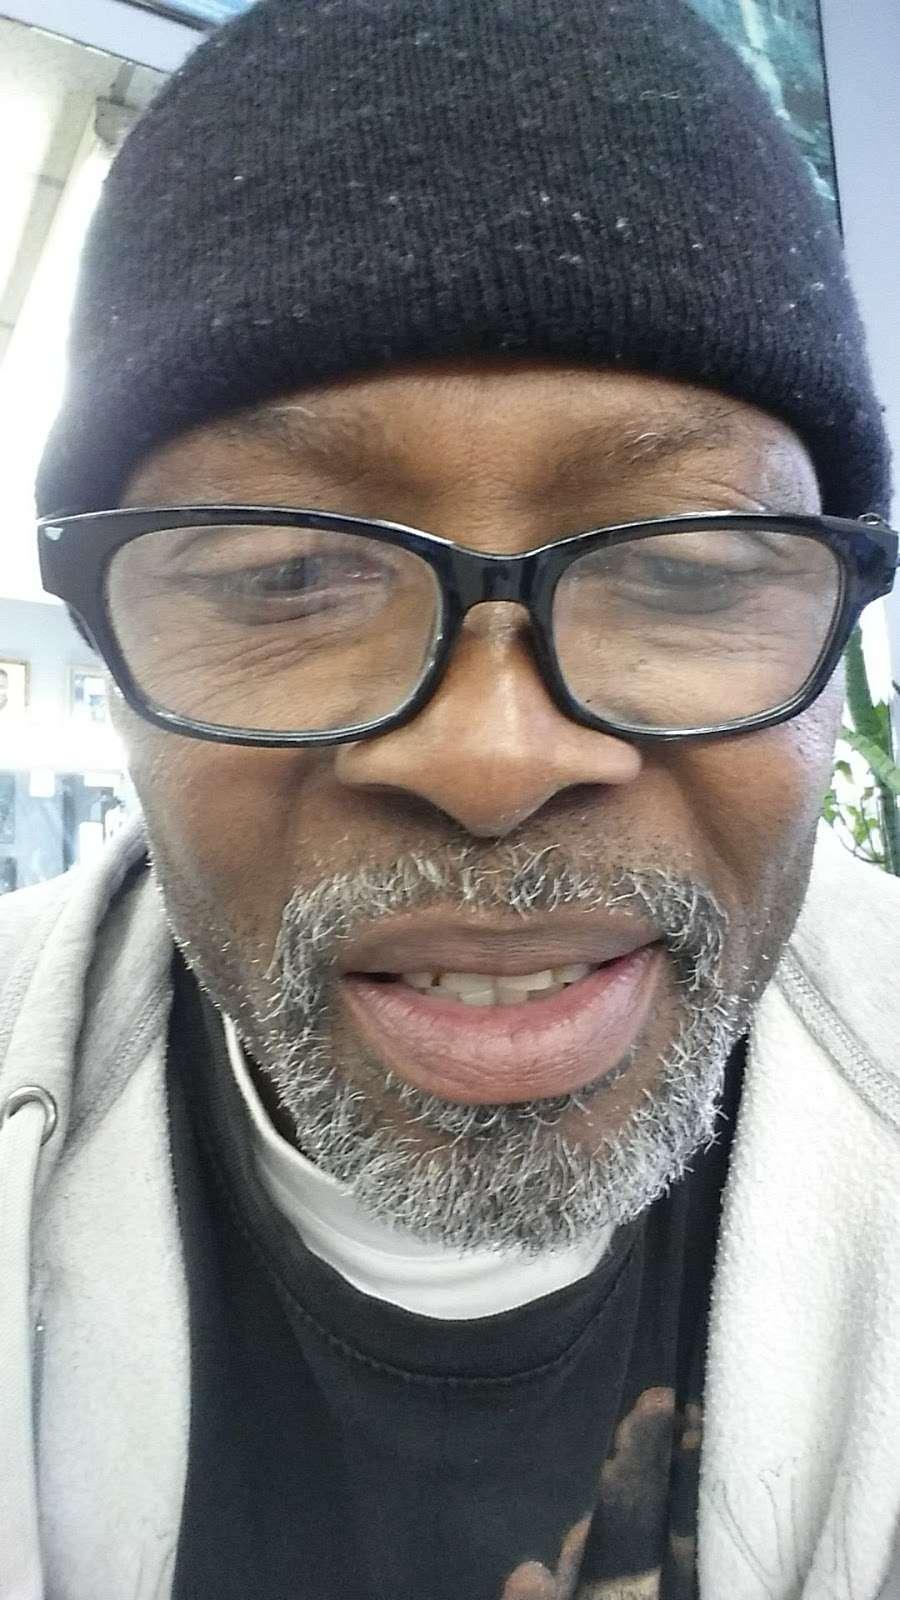 Murrays Barber Shop - hair care  | Photo 2 of 2 | Address: 538 Hegeman Ave # B, Brooklyn, NY 11207, USA | Phone: (718) 272-5081